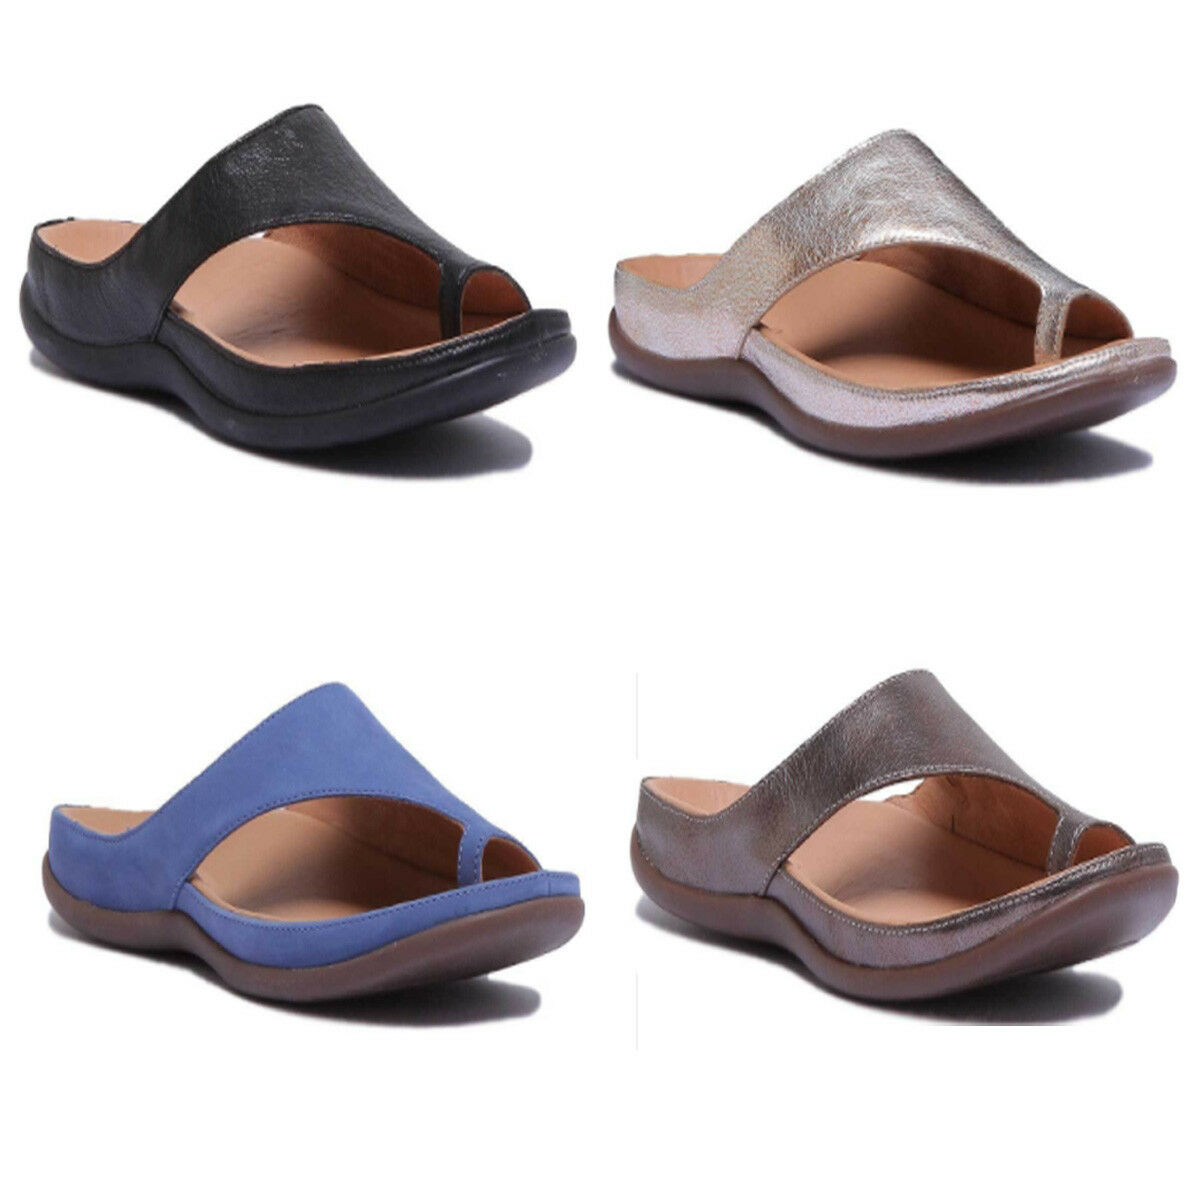 Strive Capri Women Leather Matt Silver Metallic Toe Loop Mule Sandals Size 3 - 8